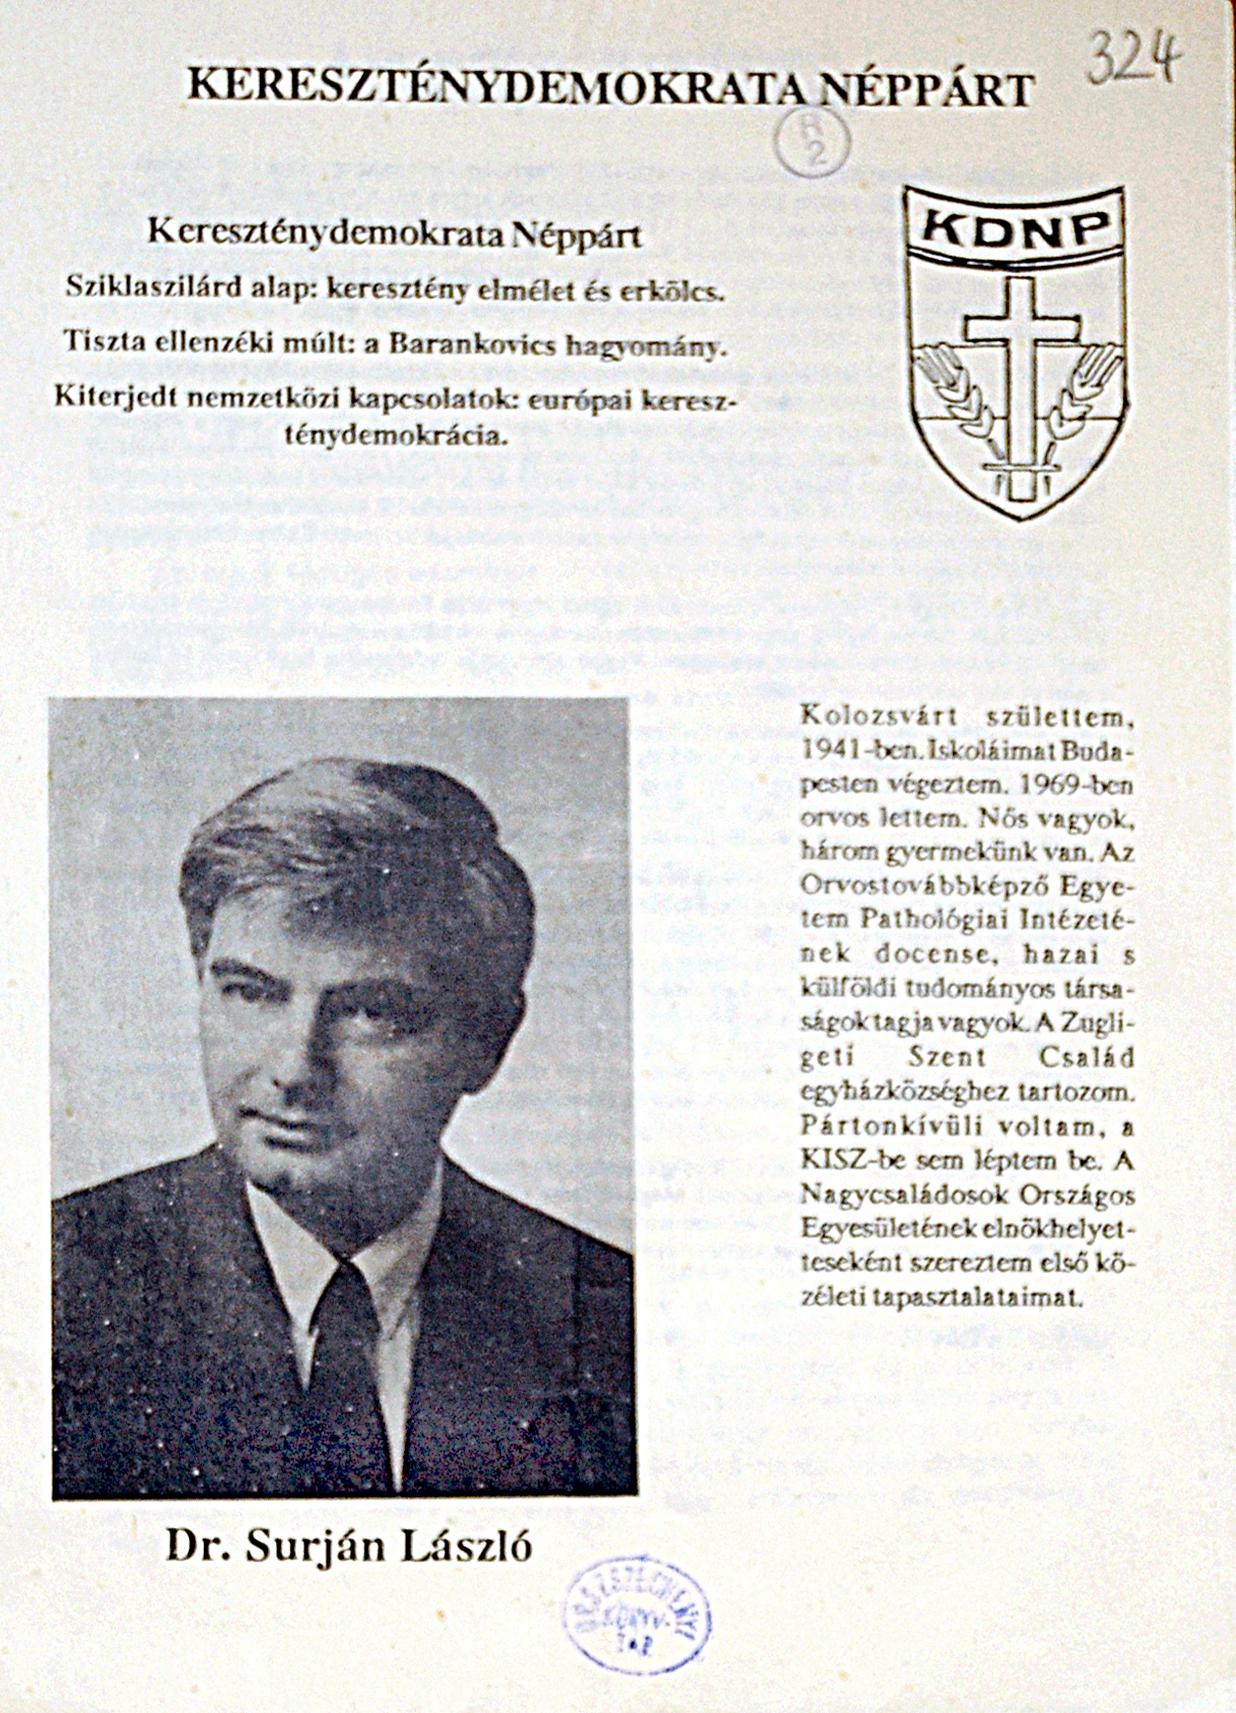 09_kdnp_surjan_laszlo_nemzetikonyvtar.JPG